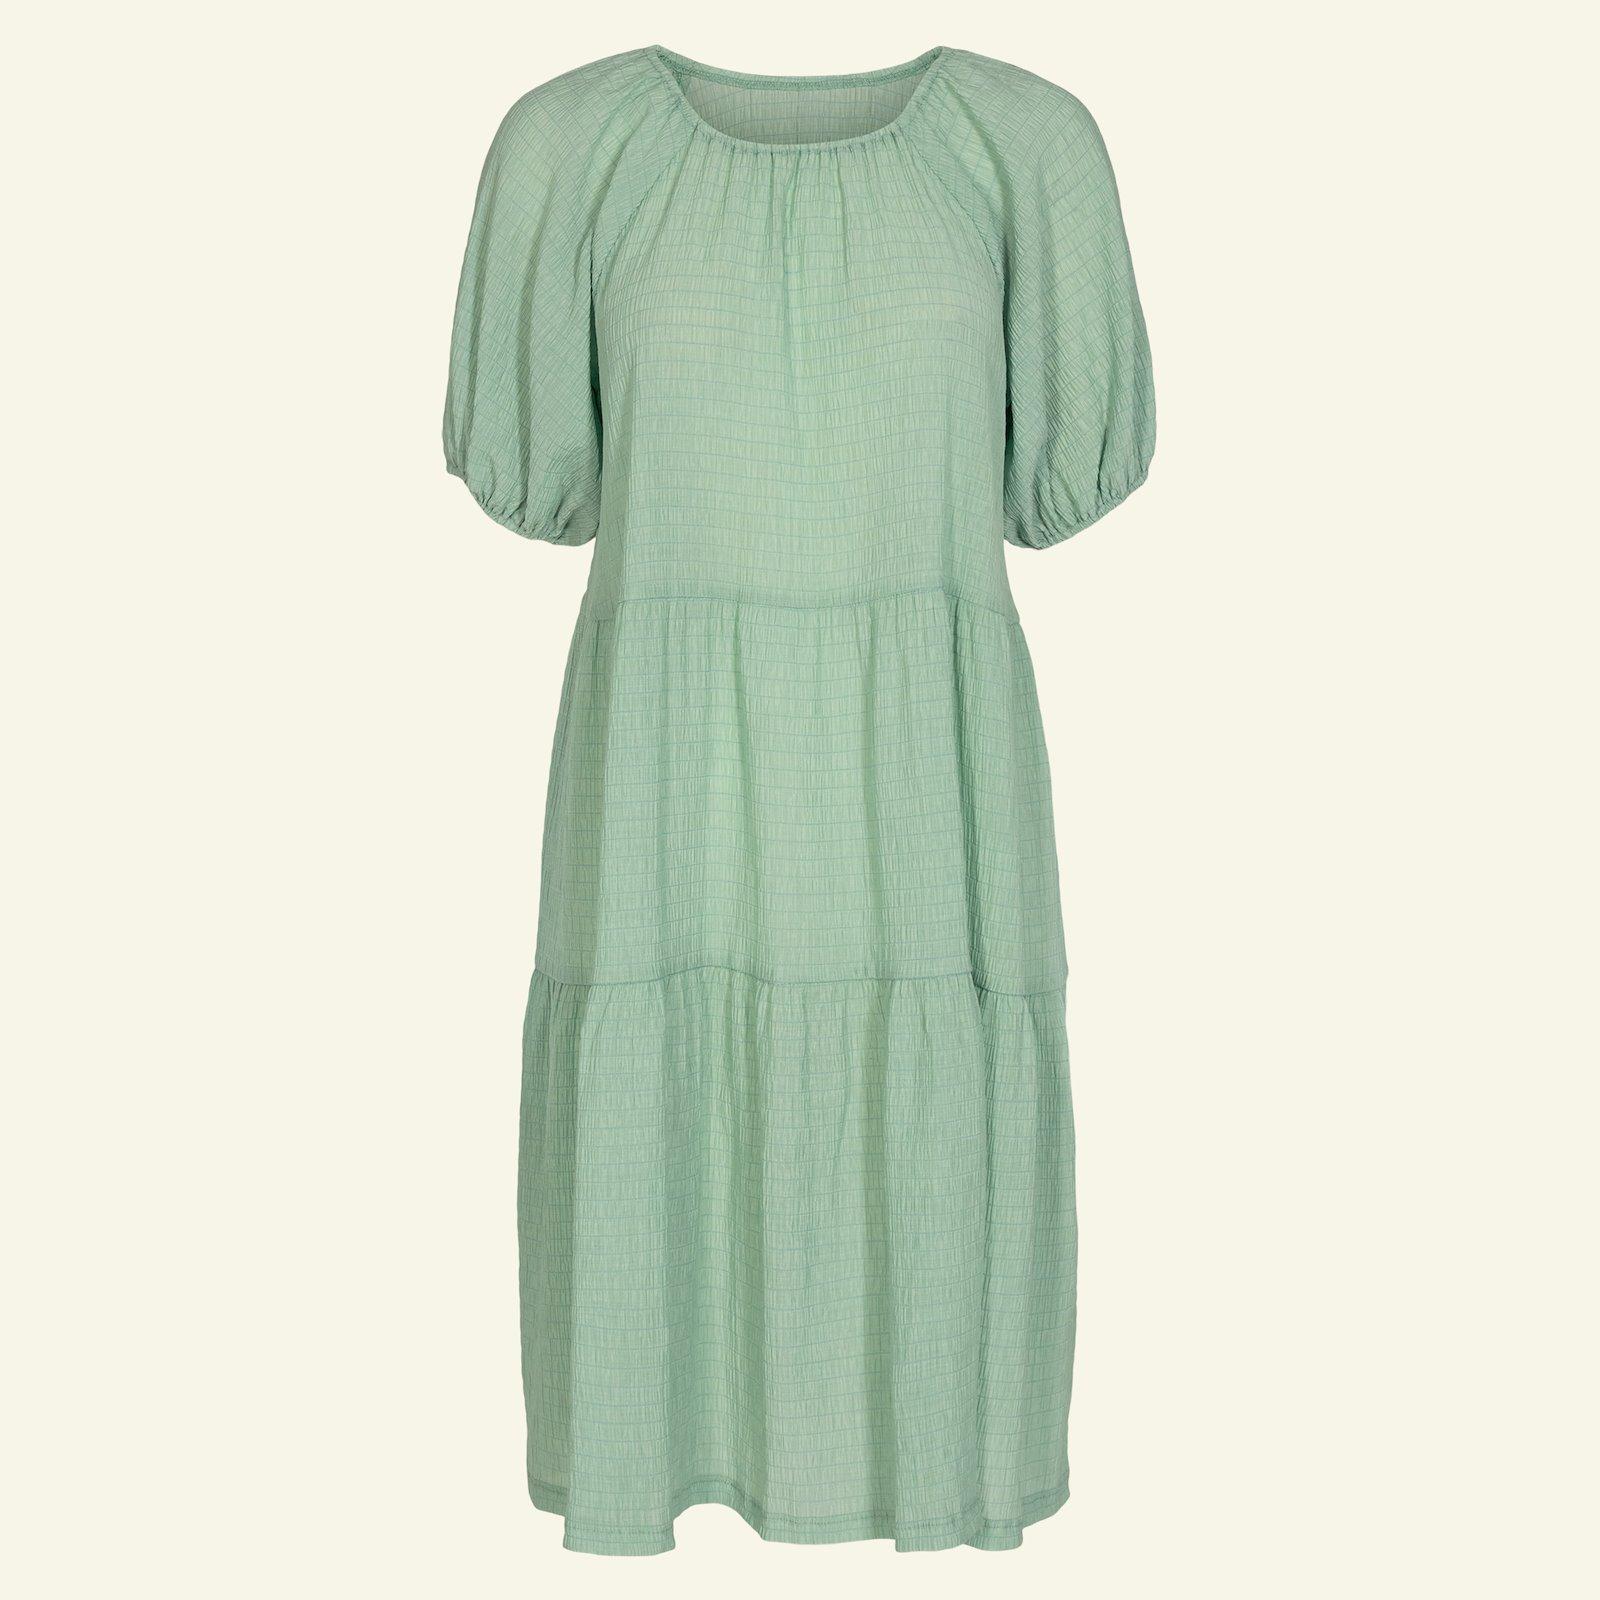 Babydoll dress, 36/8 p23168_560261_sskit